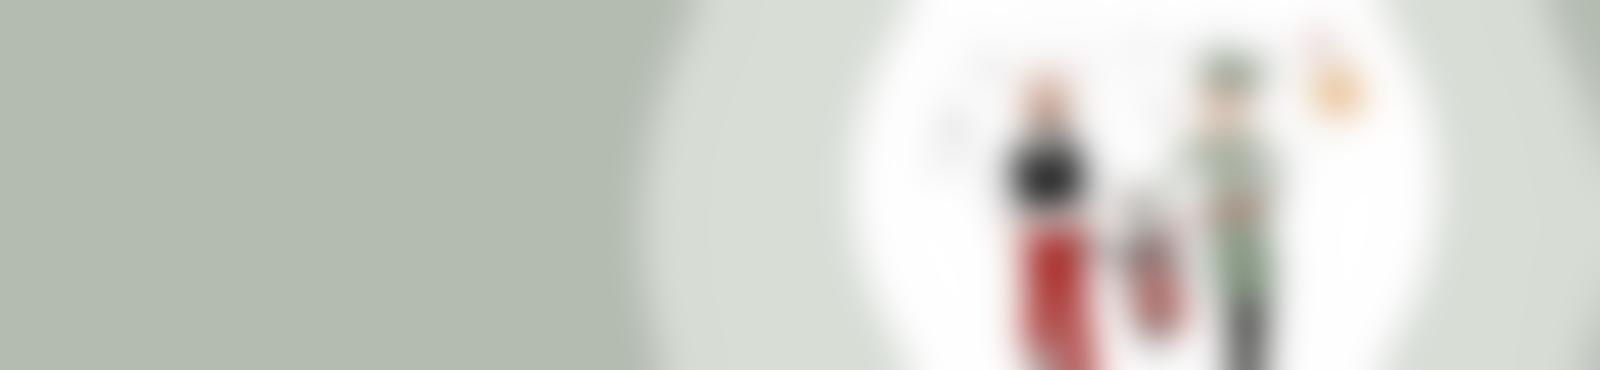 Blurred 8db37301 56c9 4fb9 aa8c 51a86c17ee6b